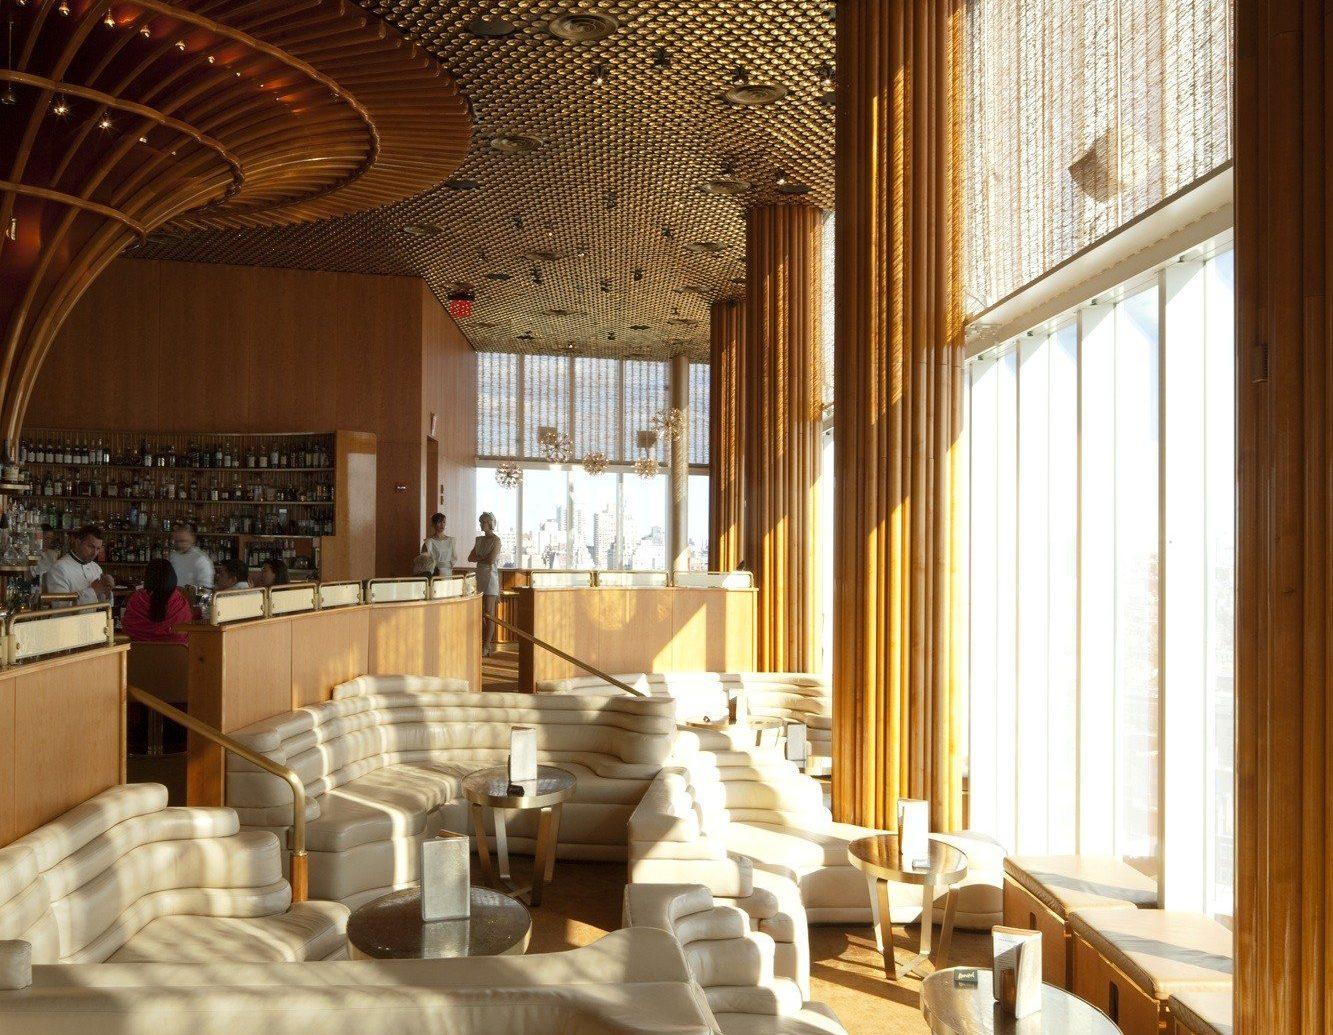 Trip Ideas indoor window room Lobby estate Architecture interior design ceiling function hall restaurant wood living room Design palace ballroom furniture